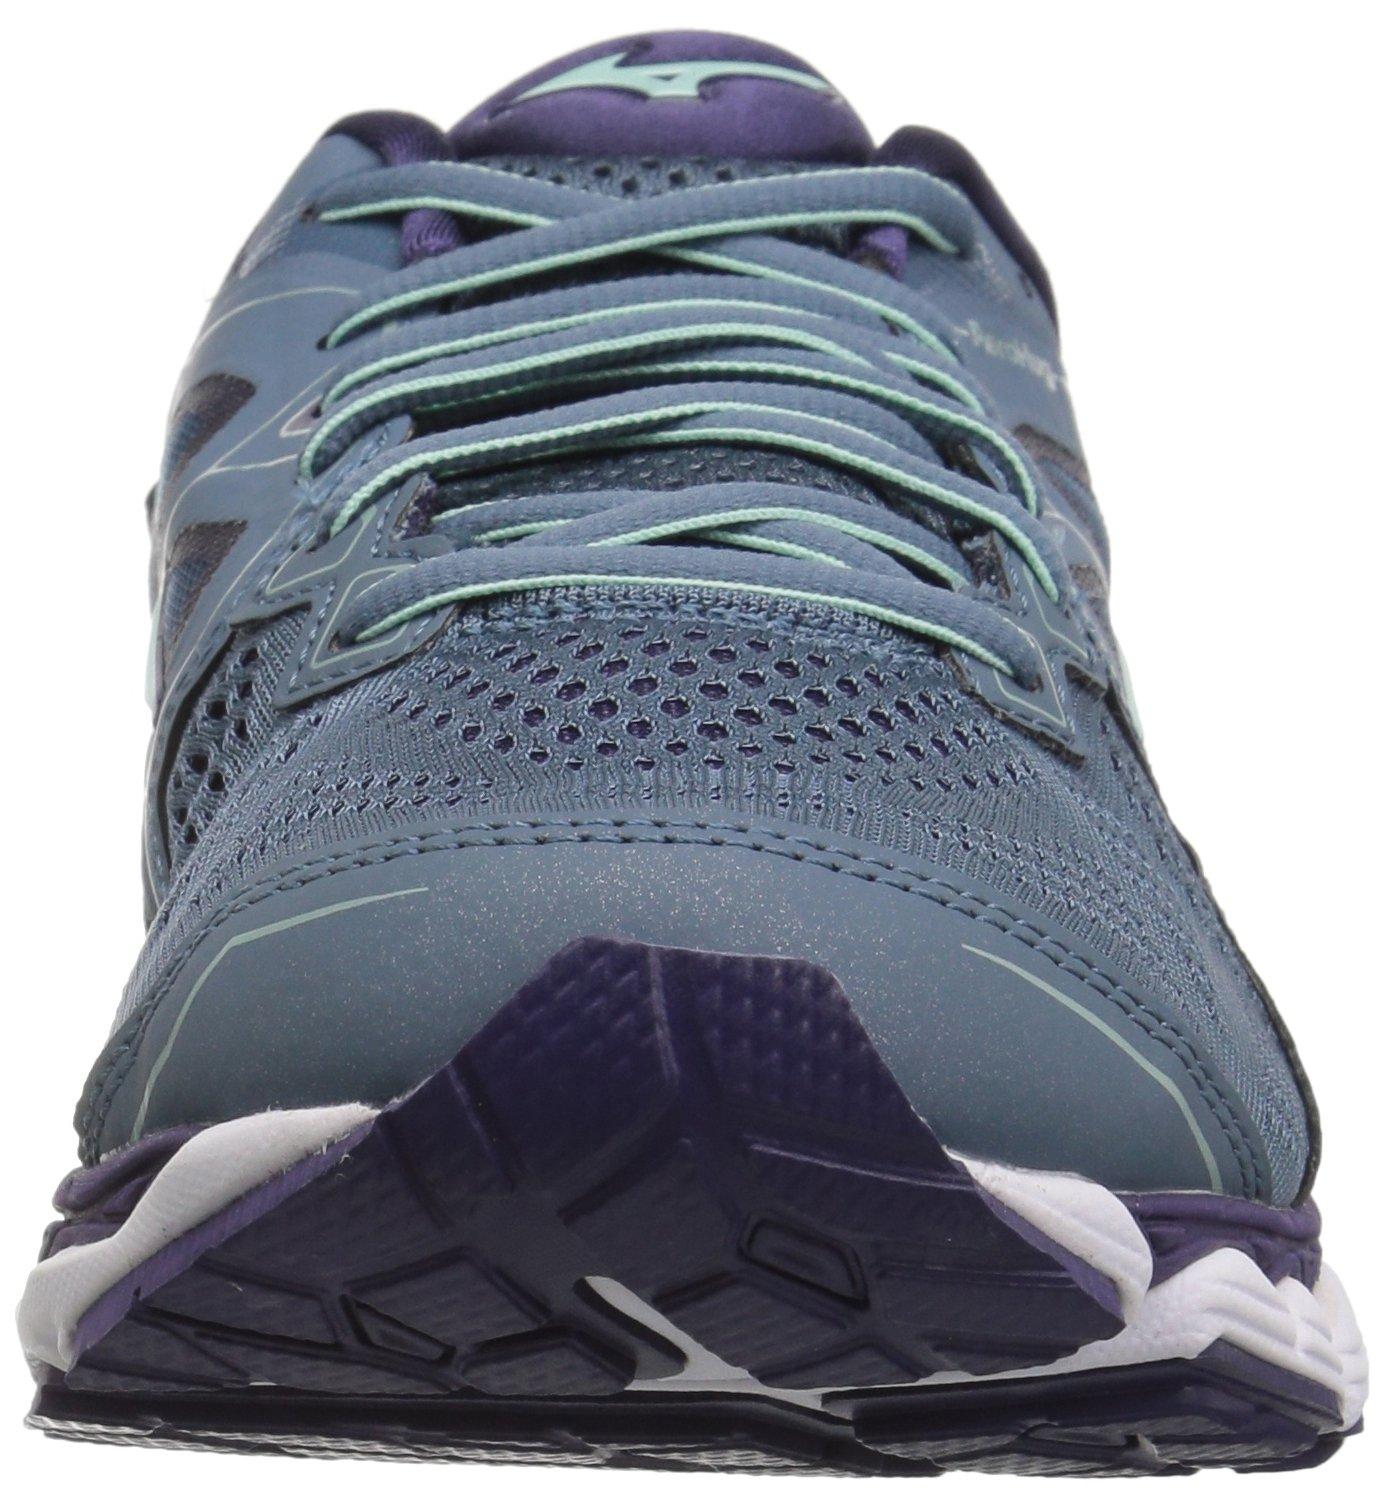 Mizuno Women's Wave Sky 2 Running Shoe B076YC2Q19 6.5 B(M) US|Blue Mirage/Purple Plumeria